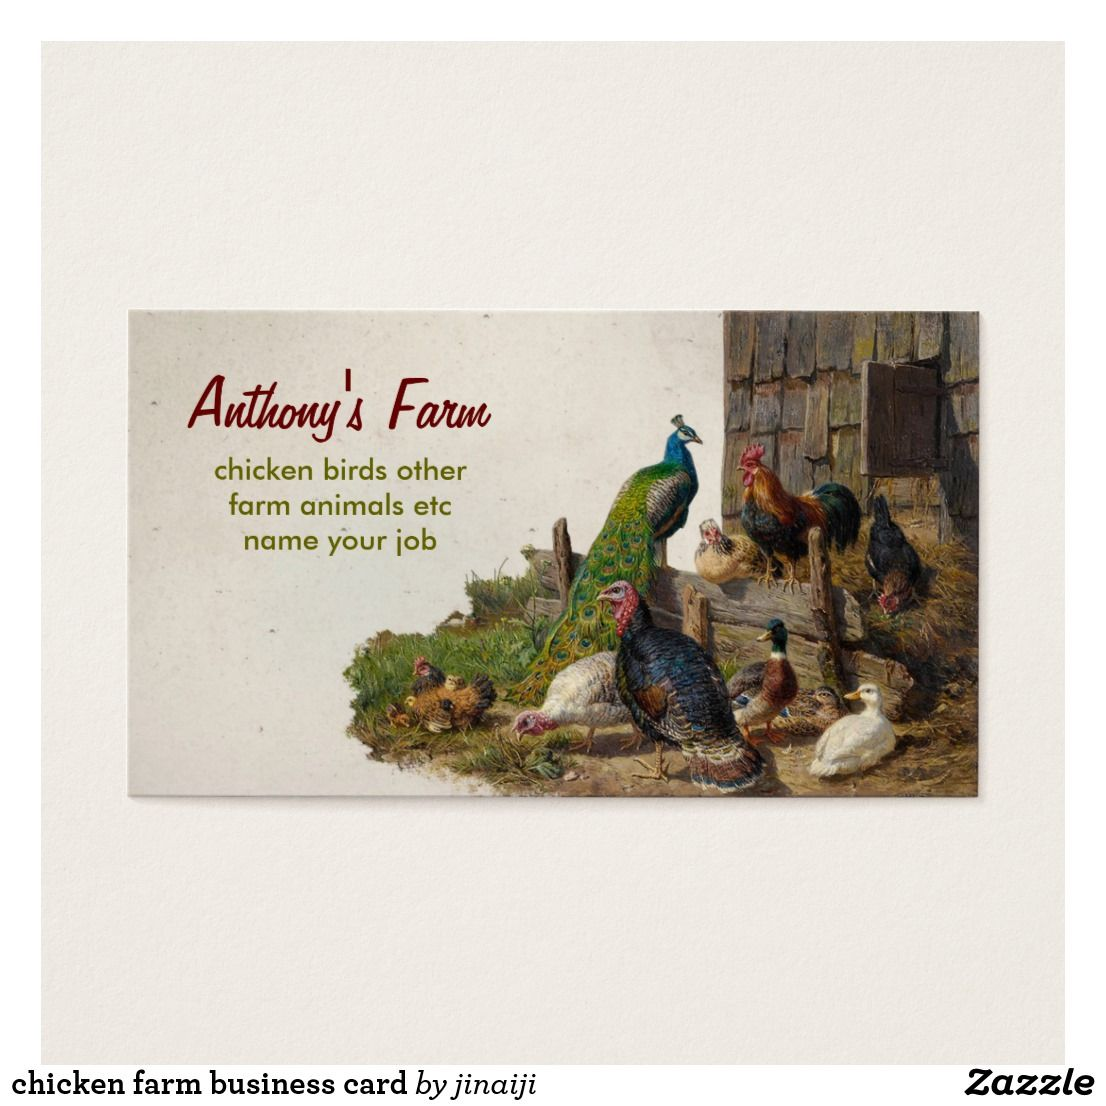 chicken farm business card | Farm Ranch Business Cards | Pinterest